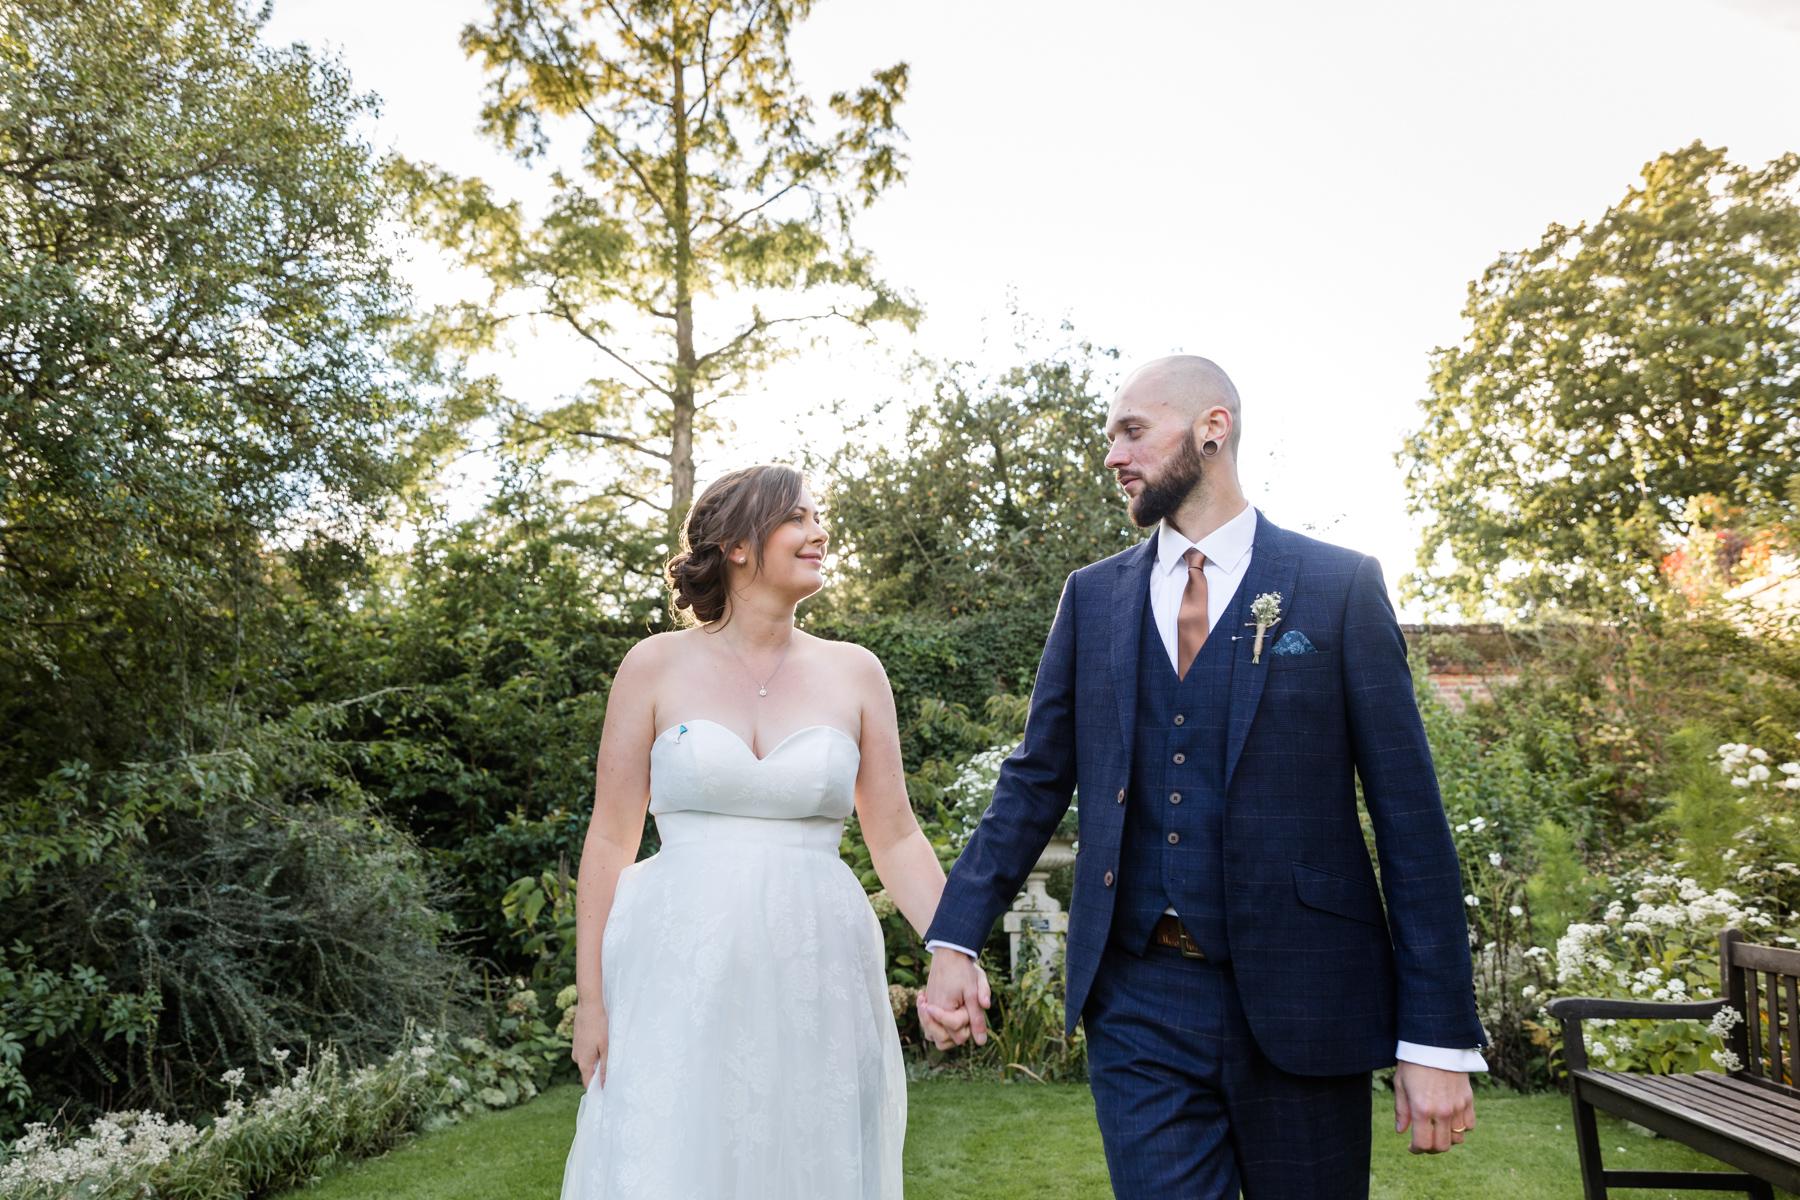 Deene Park white garden wedding couple walking